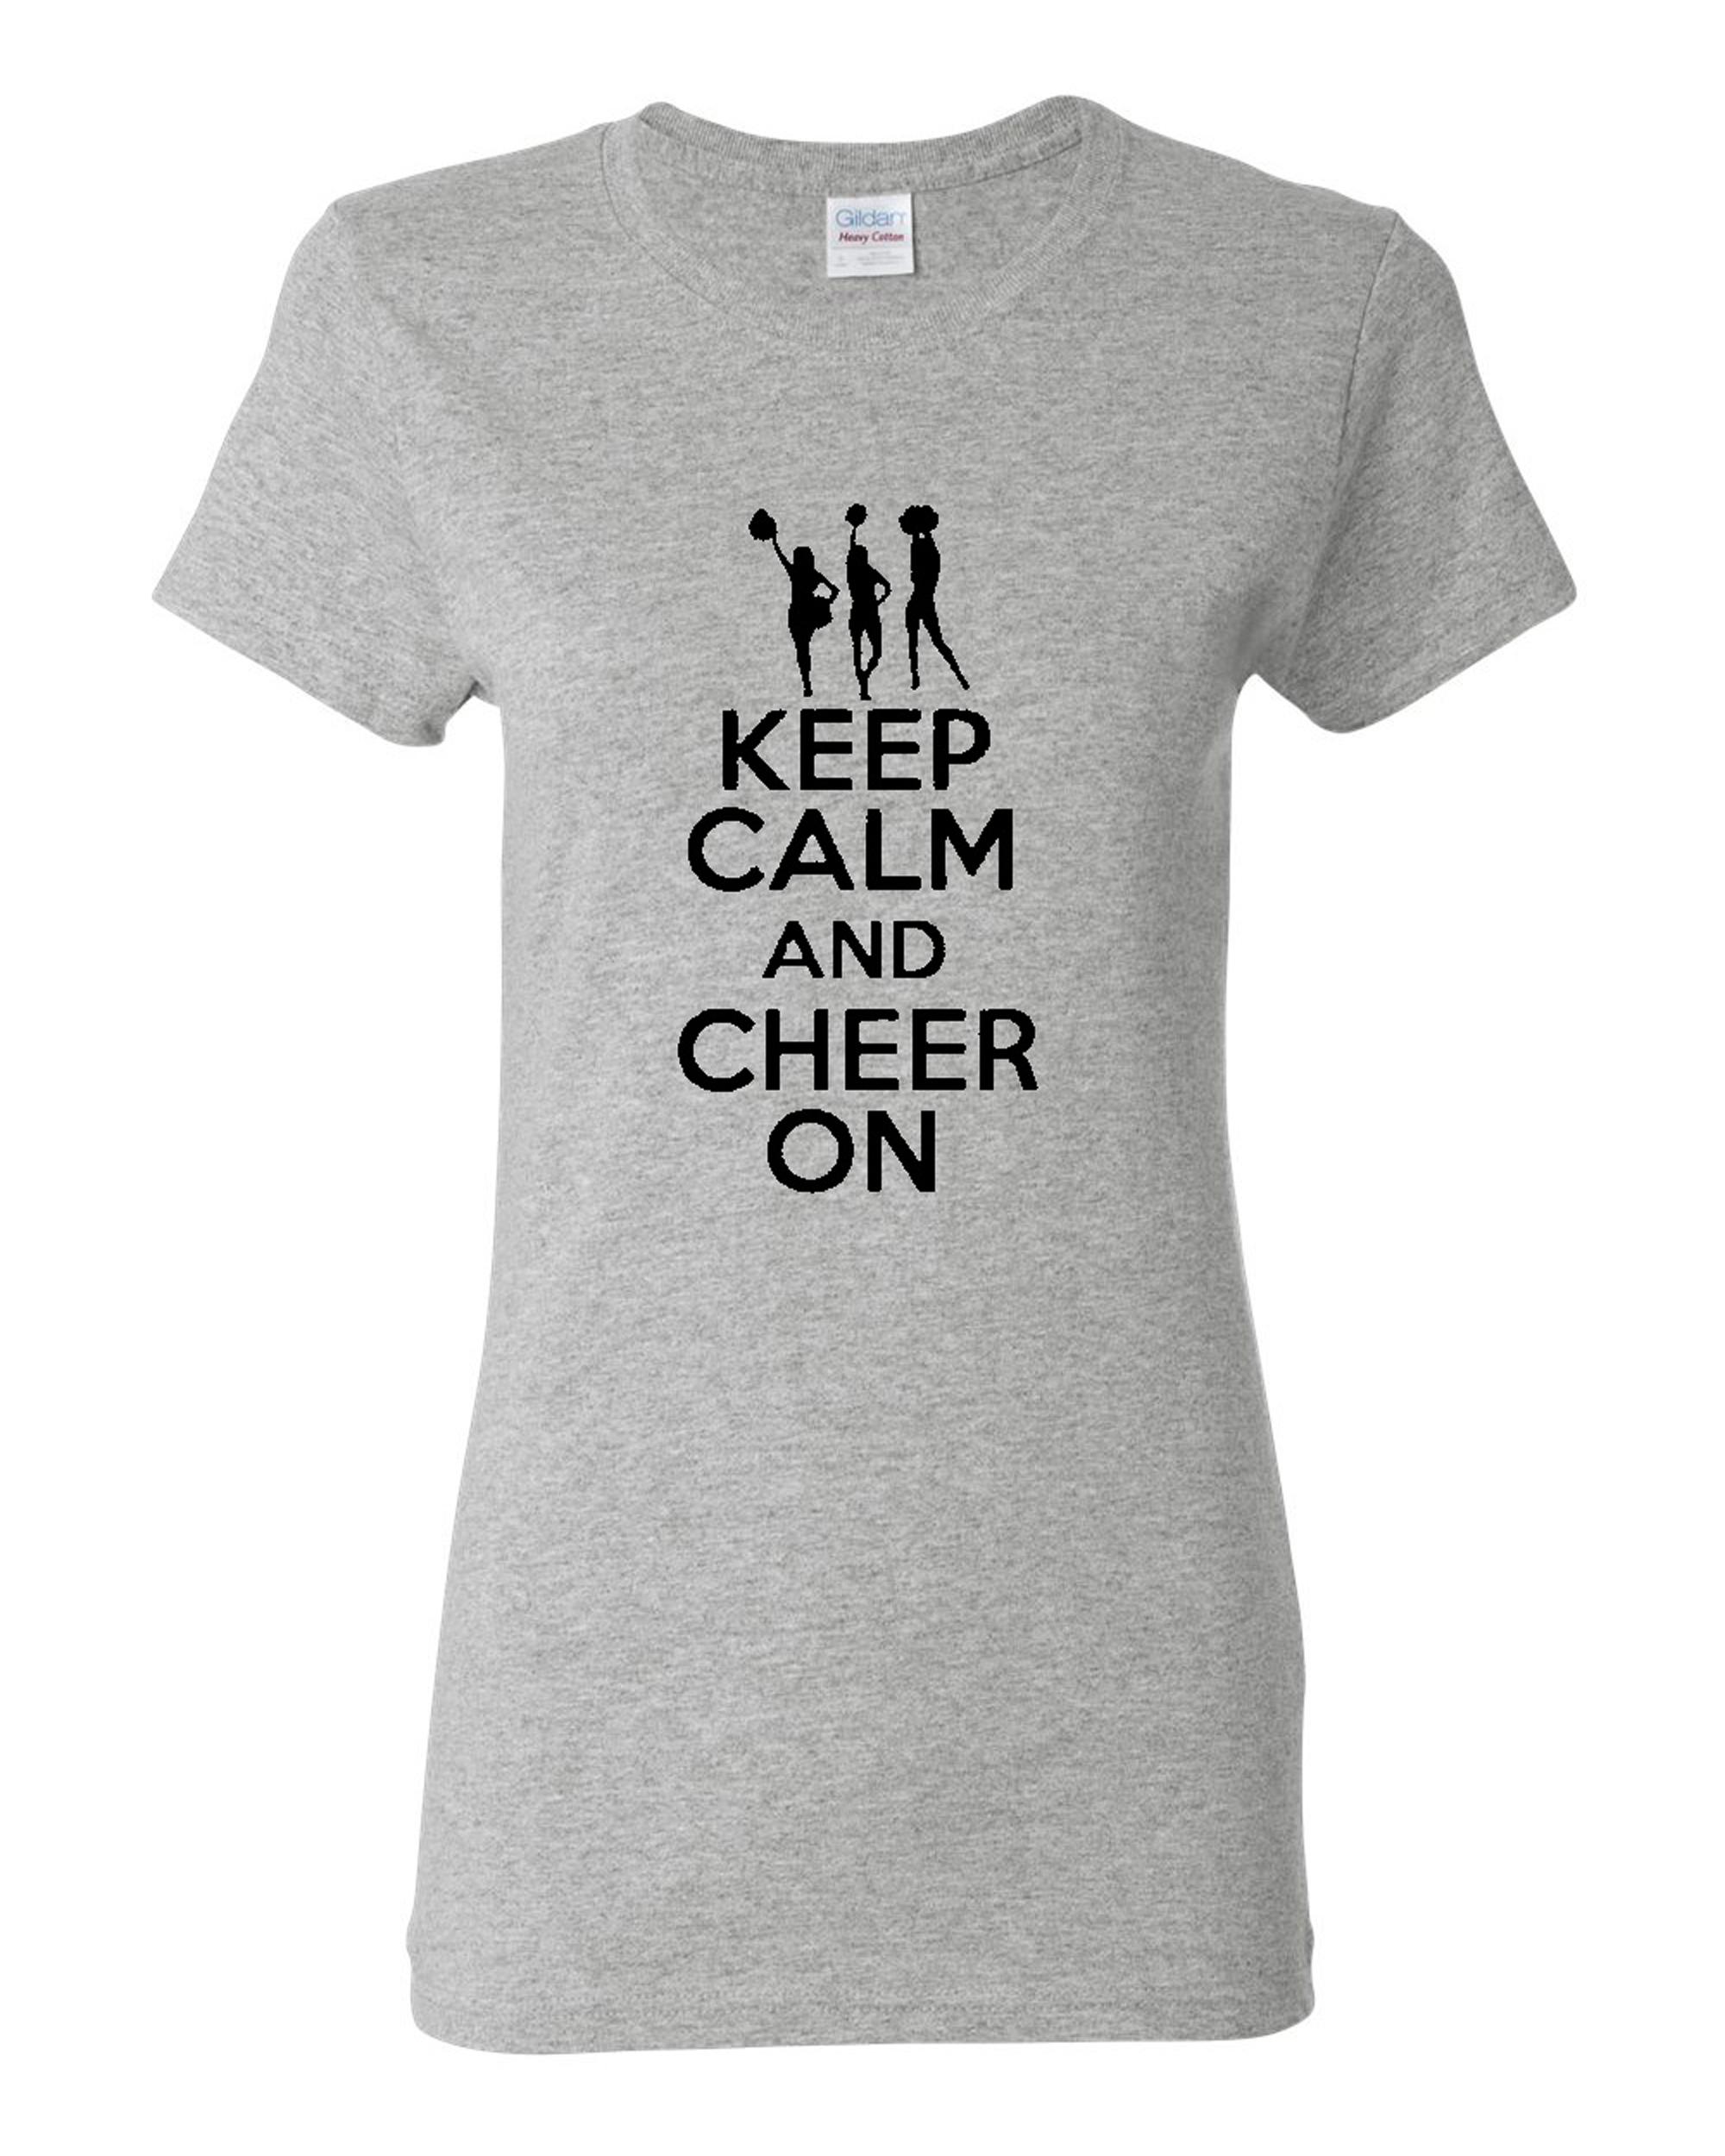 Ladies Keep Calm and Cheer On T-Shirt Tee